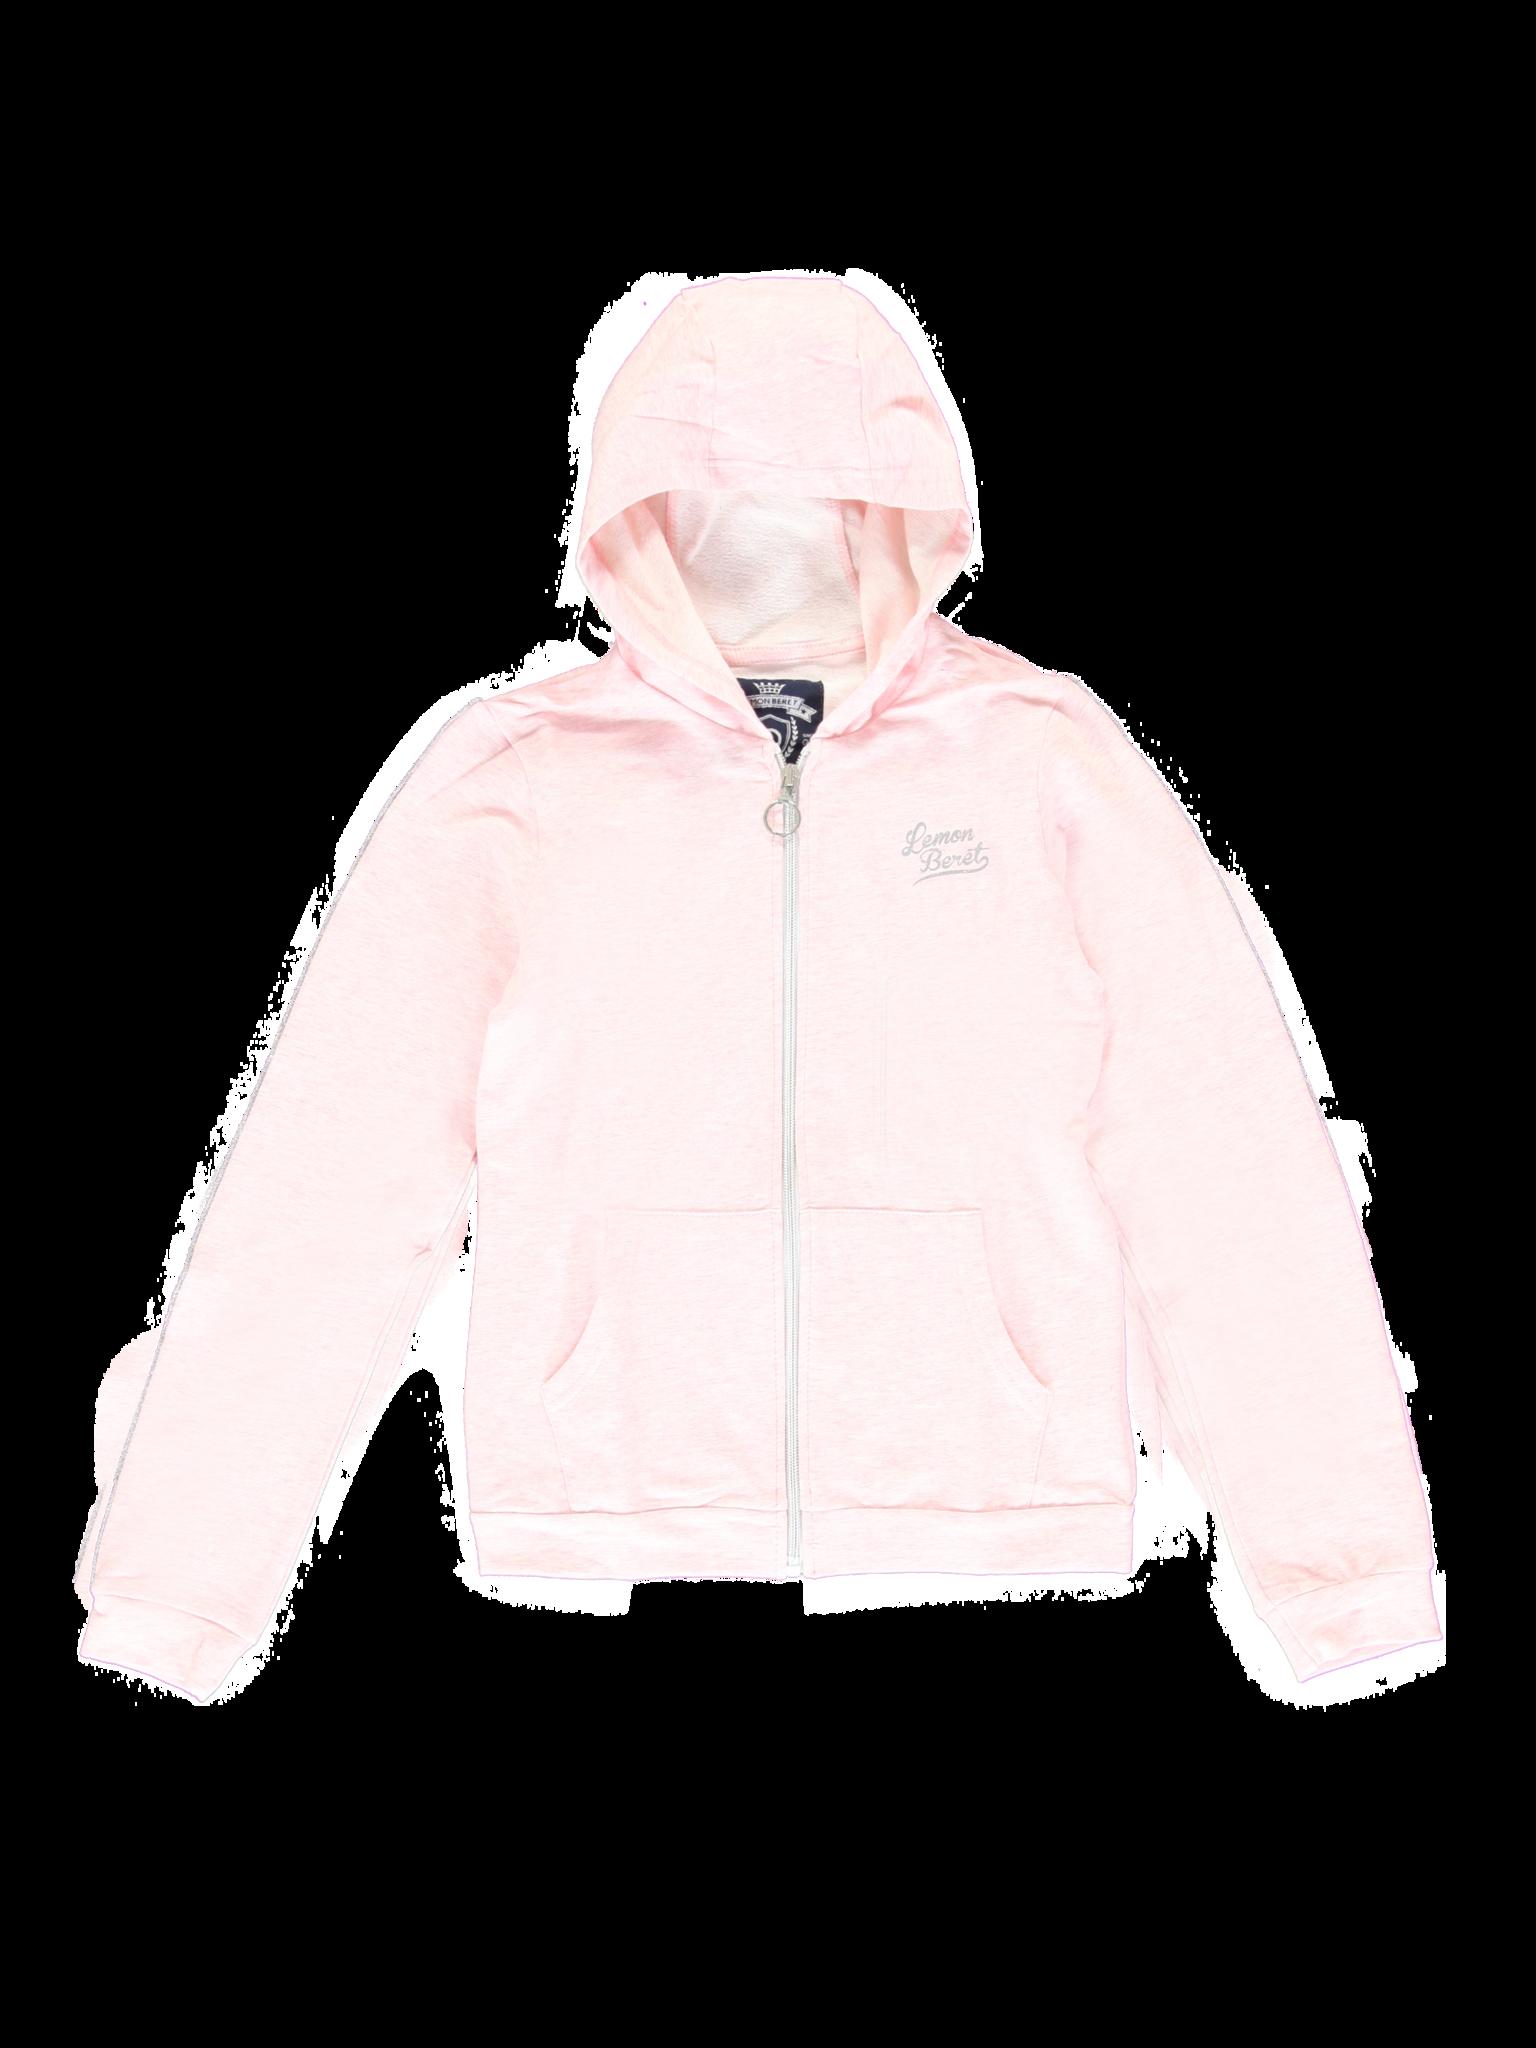 All Brands | Summerproducts Teen Girls | Cardigan Sweater | 10 pcs/box